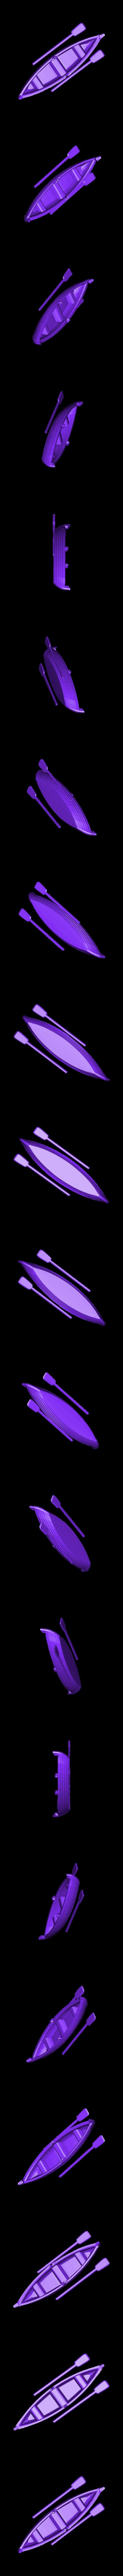 Boat.stl Download free STL file Boat • 3D print template, 3DBuilder